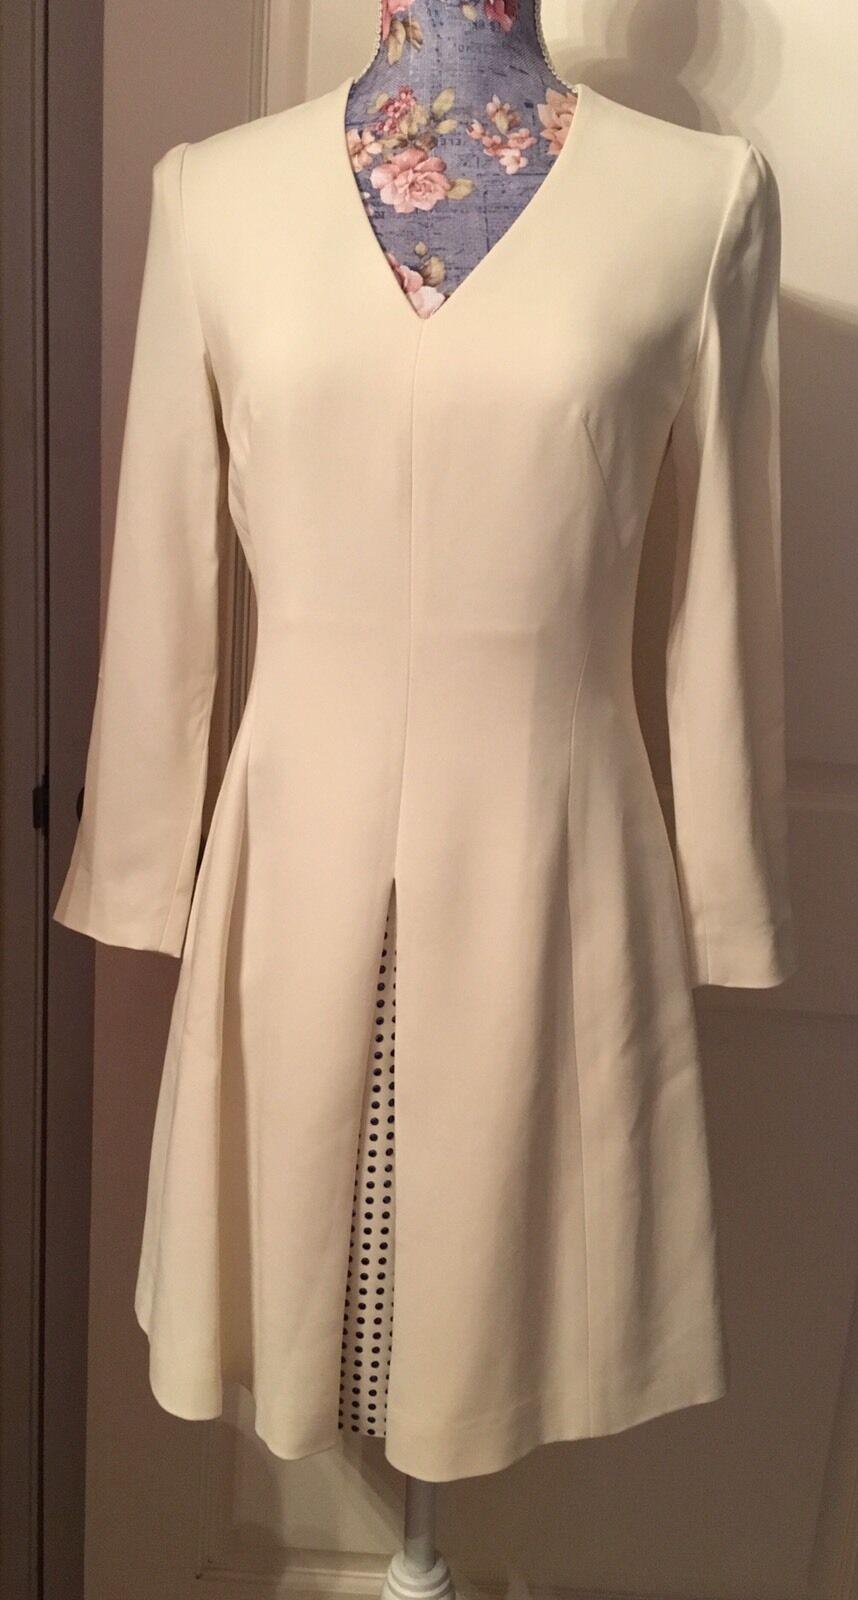 NWT 435  Just Cavalli Ivory Short Dress, Size US4(IT40)